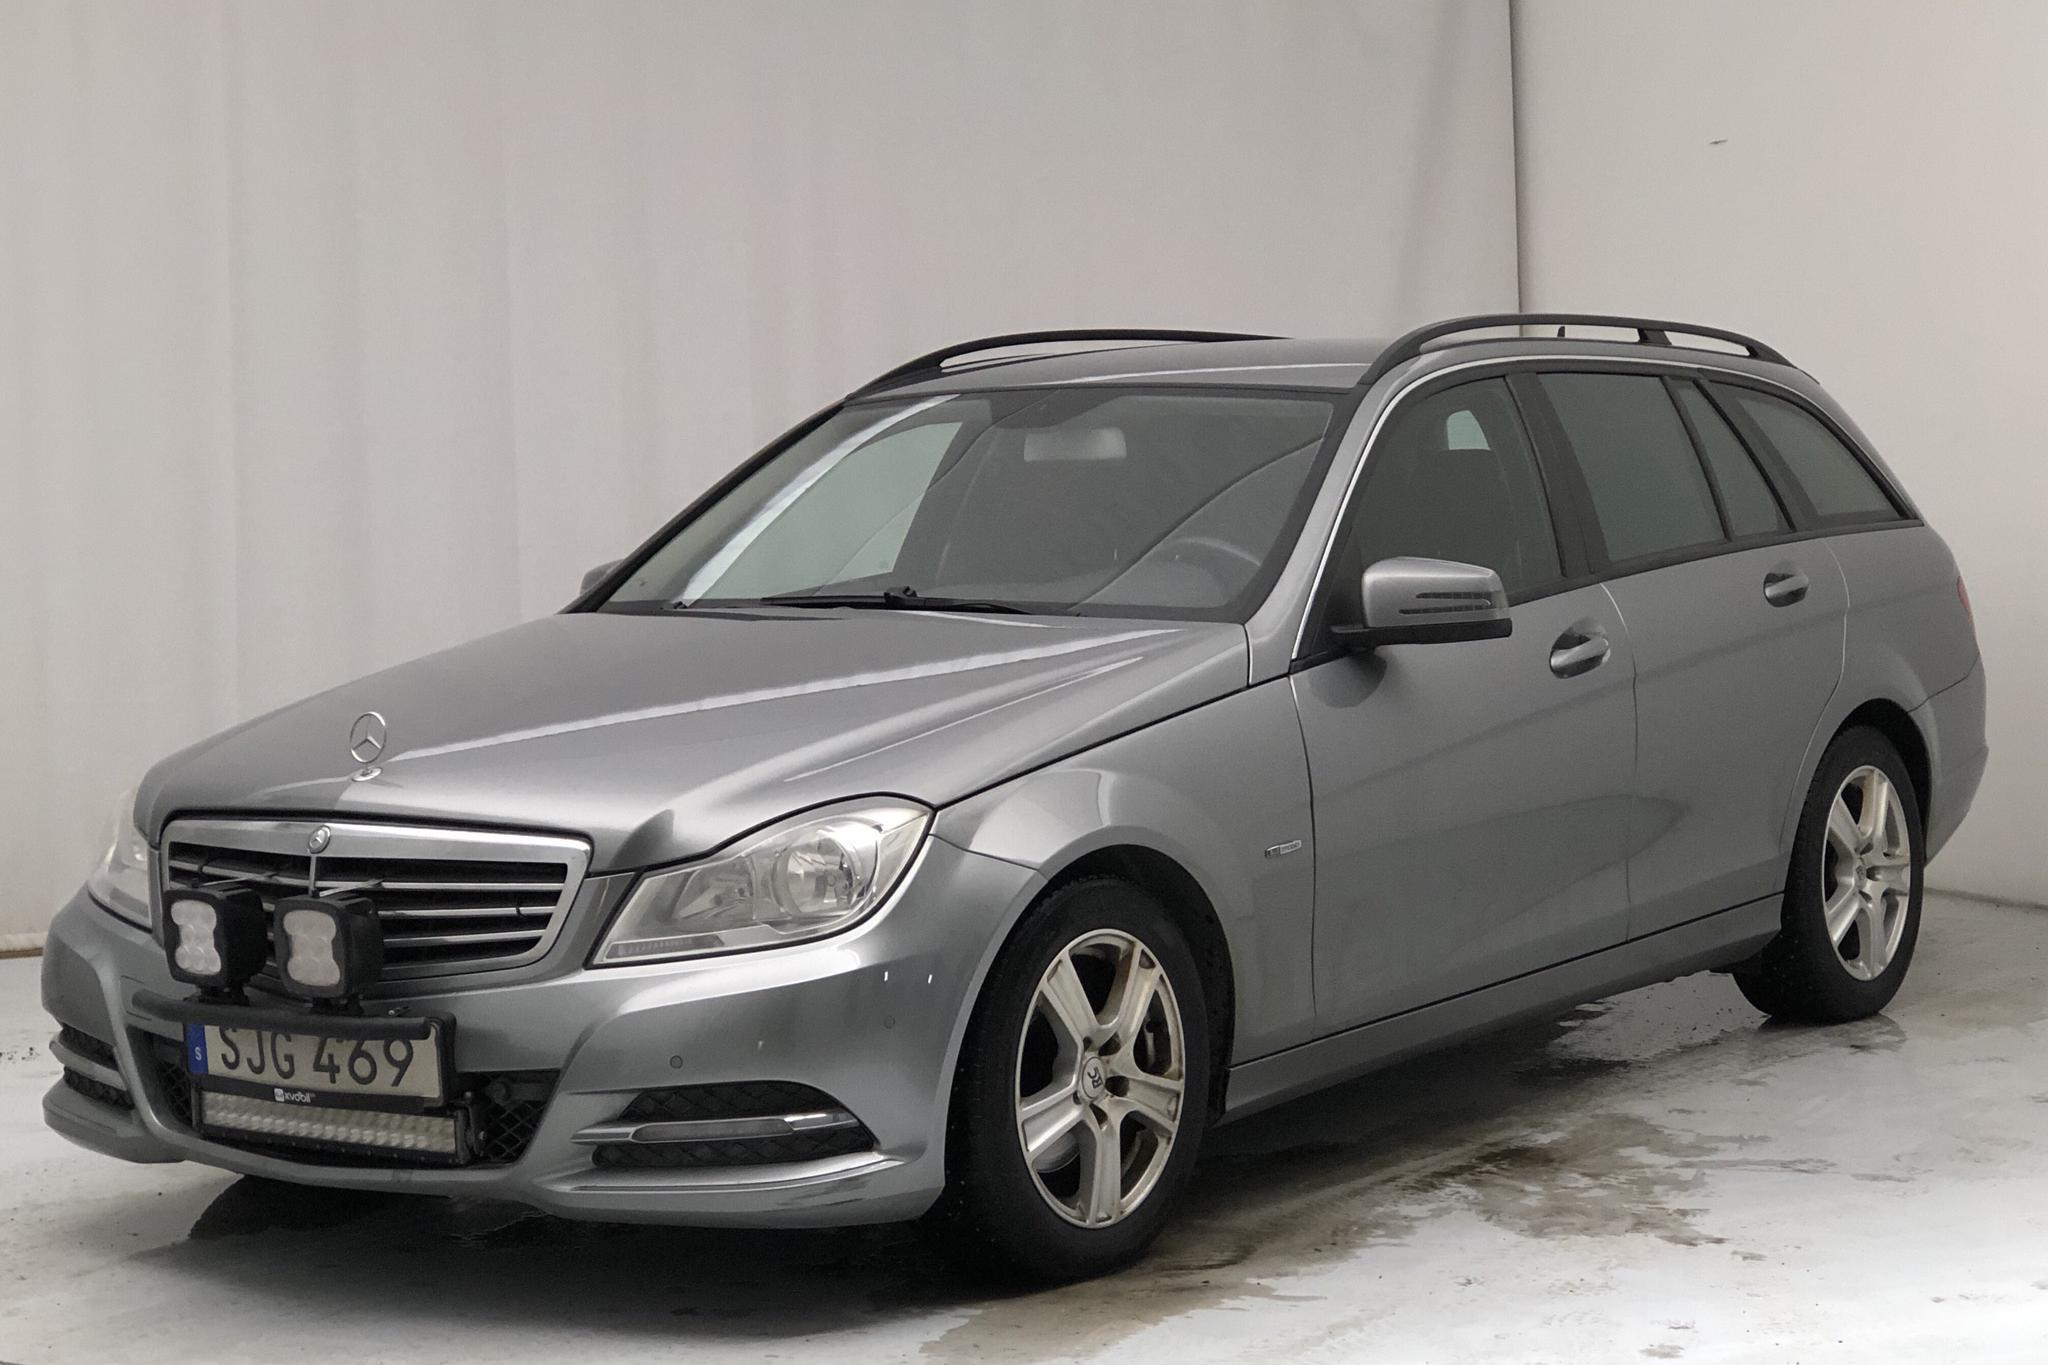 Mercedes C 250 CDI 4Matic Kombi S204 (204hk) - 329 950 km - Automatic - gray - 2012